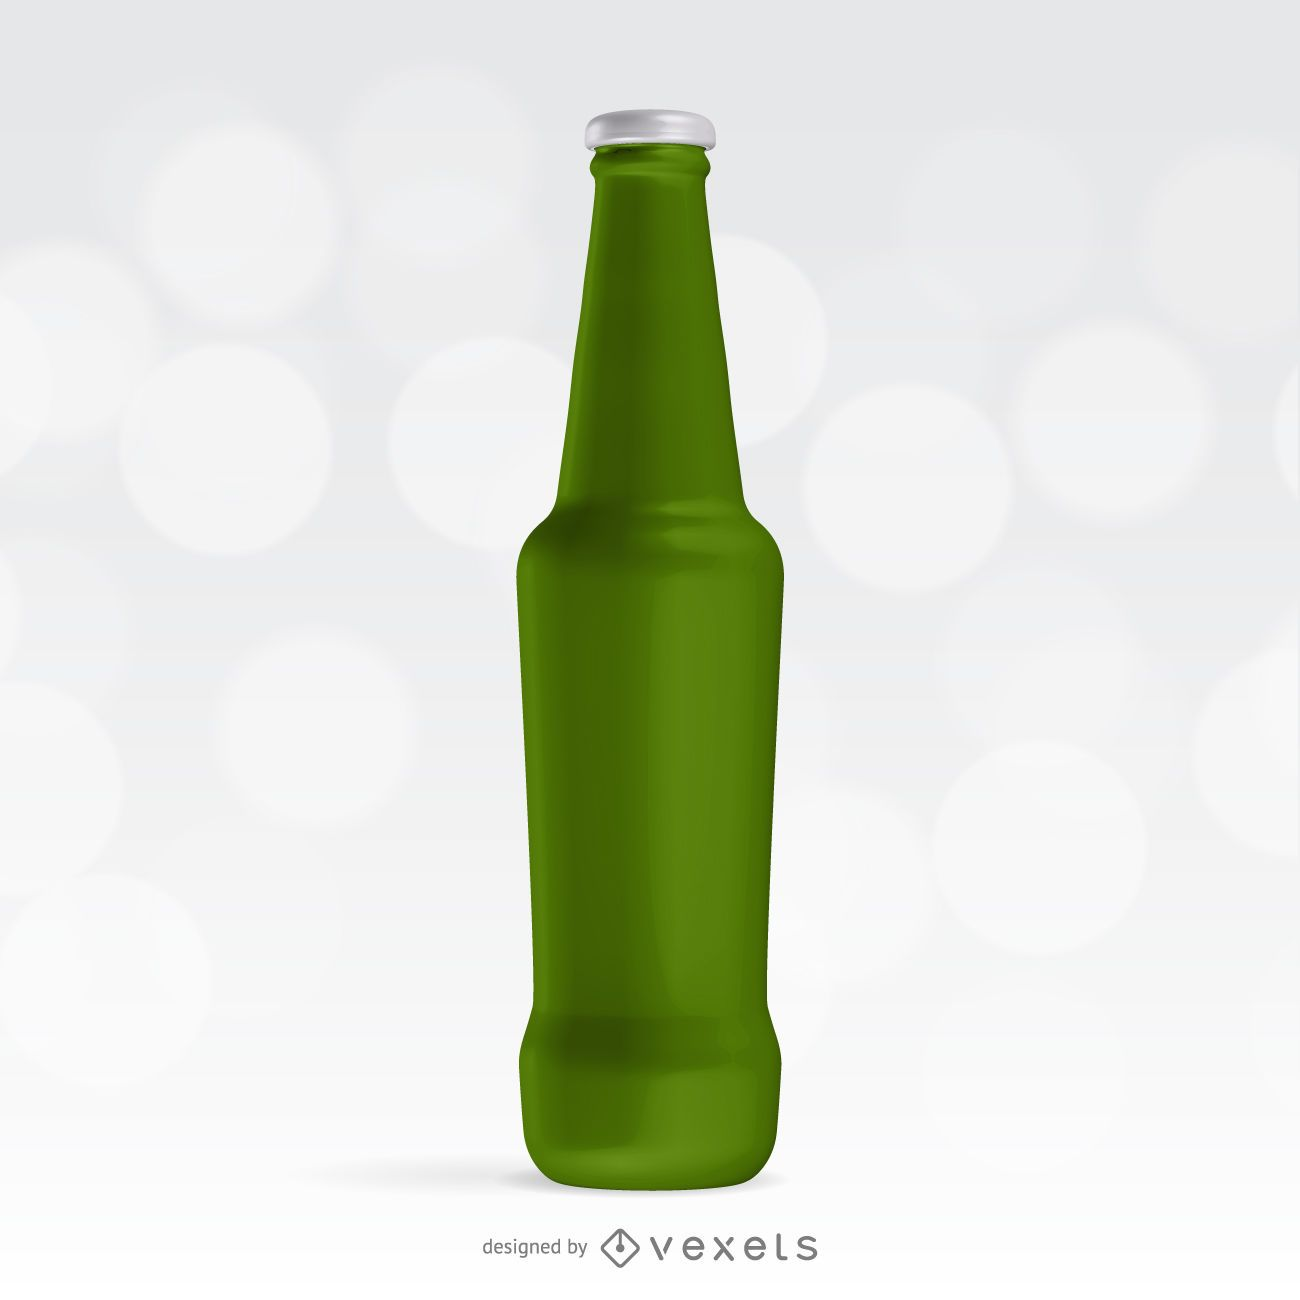 Soda bottle illustrated packaging